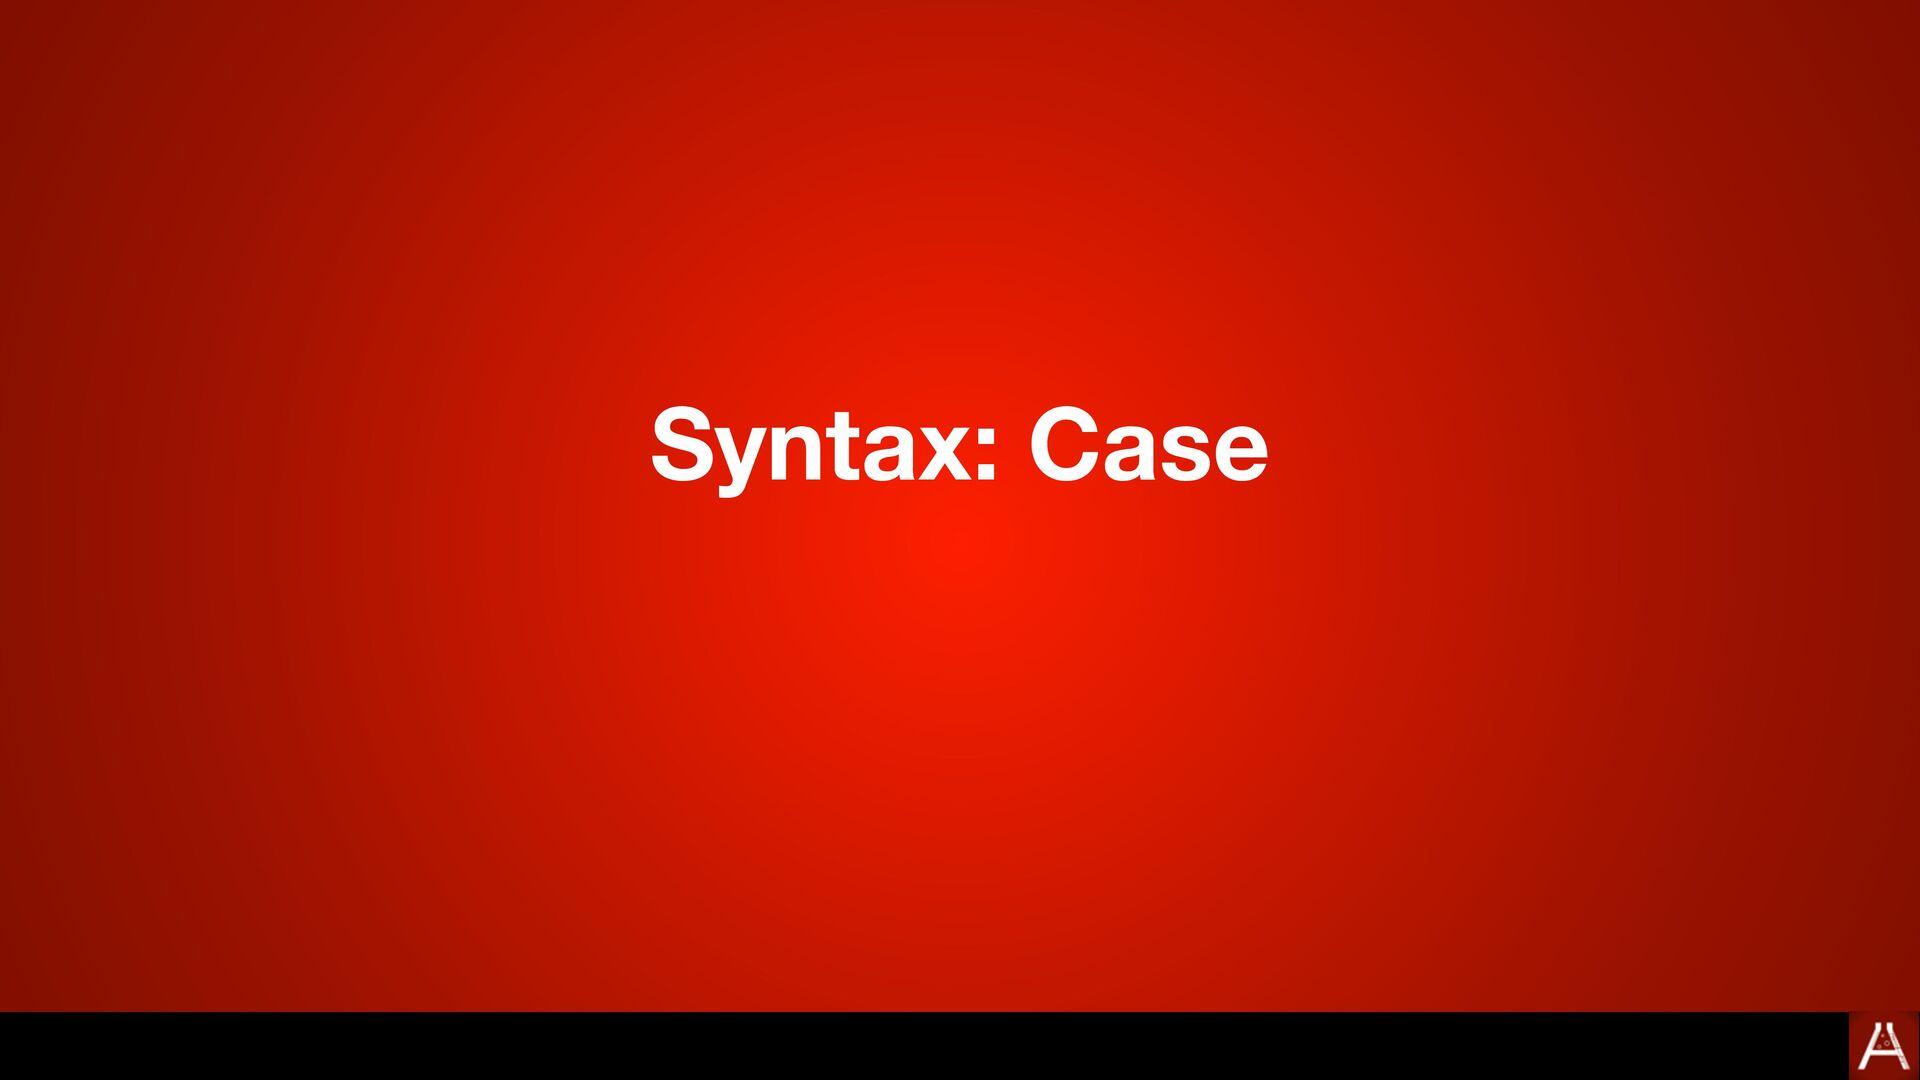 Syntax: Case